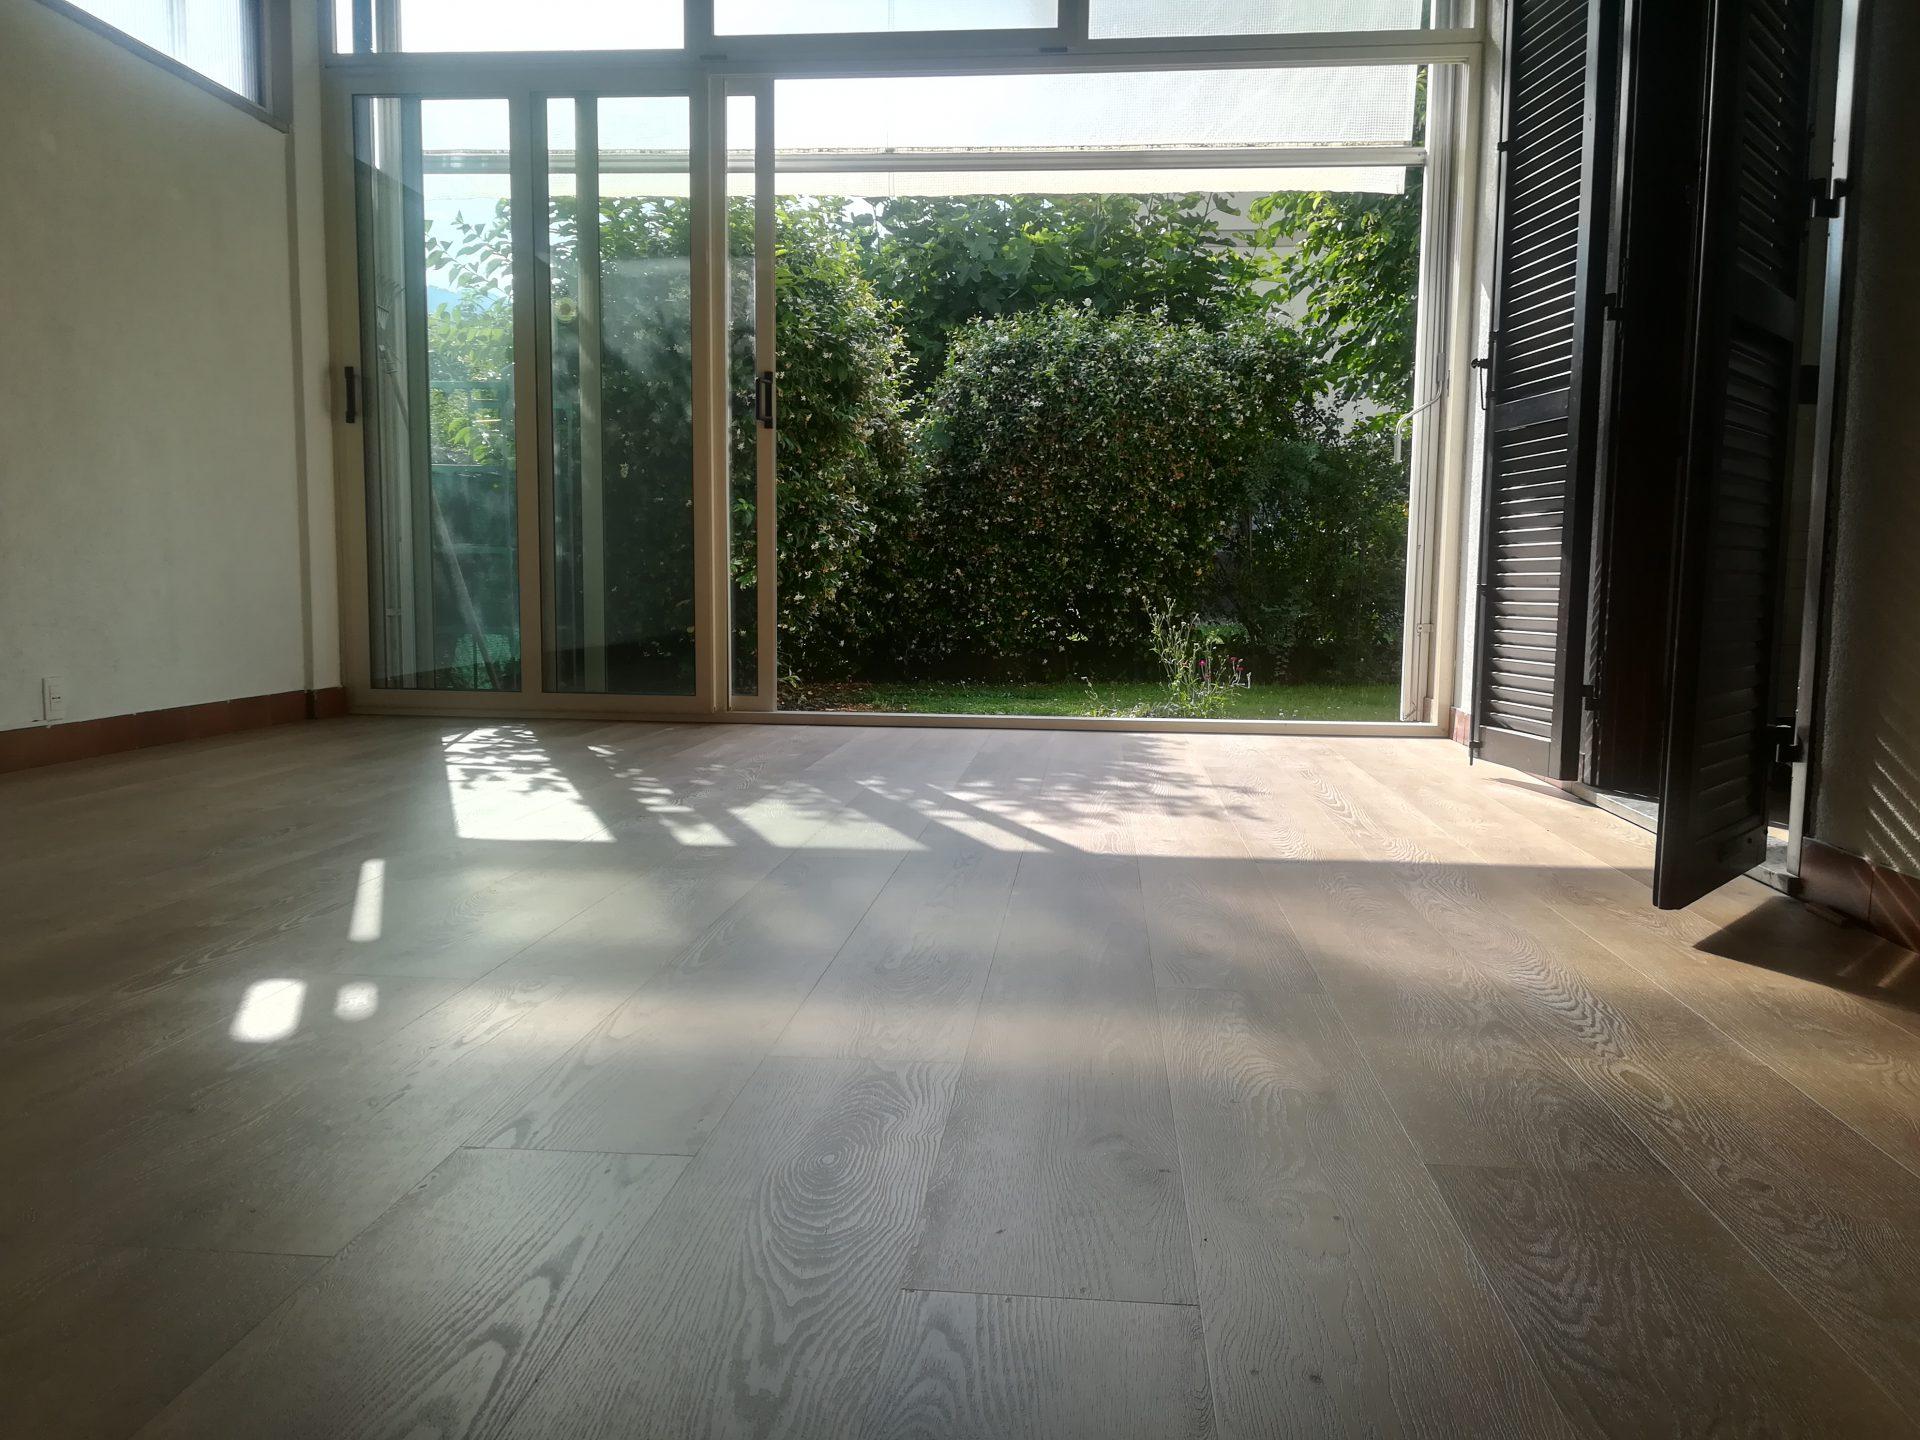 Sala con pavimento vinilico